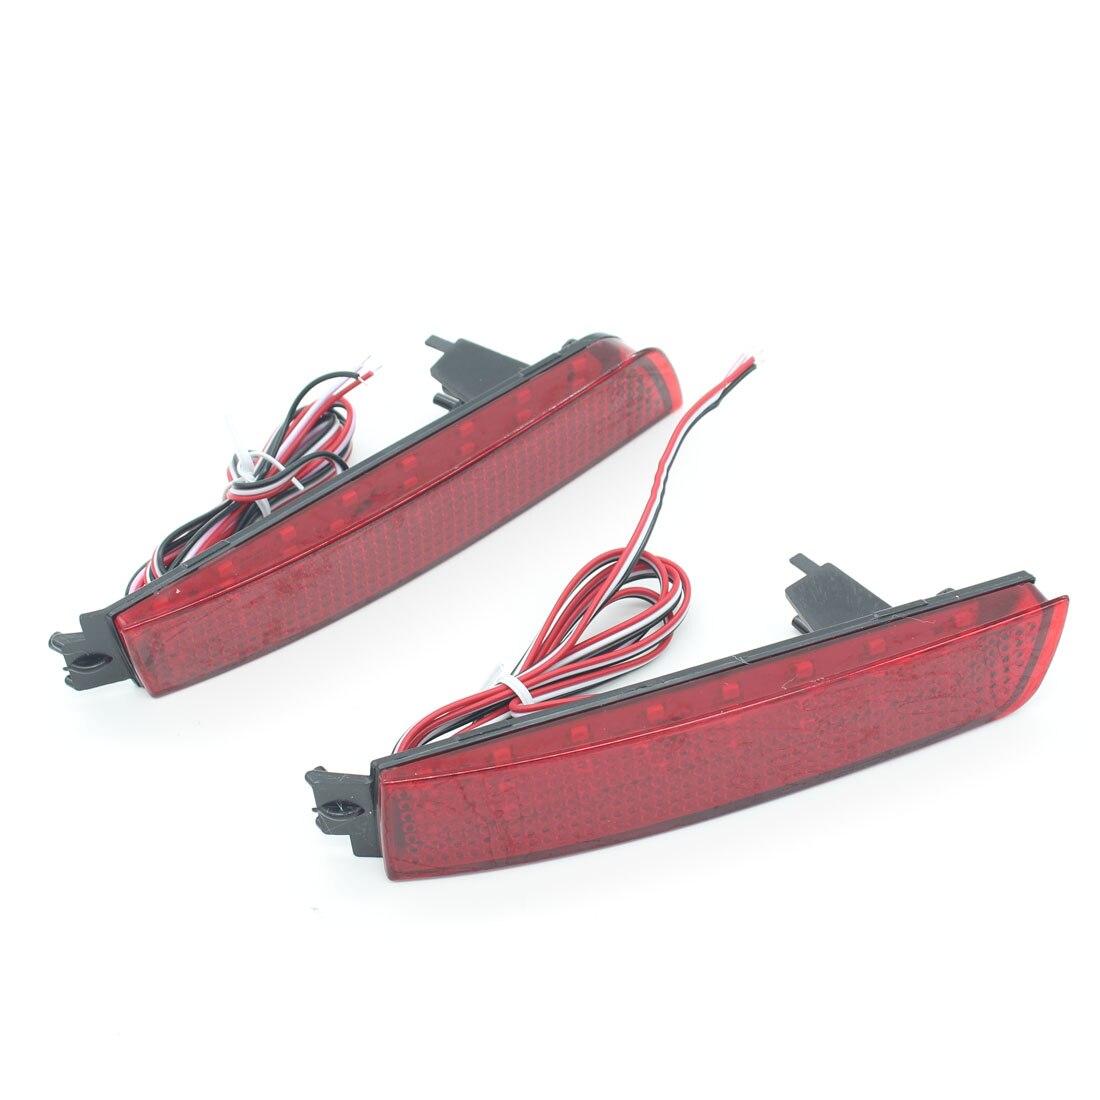 Dongzhen Fit For Nissan Bluebird Sylphy Almera LED Red Rear Bumper Reflectors Light Night Running Brake Warning Lights Lamp<br>